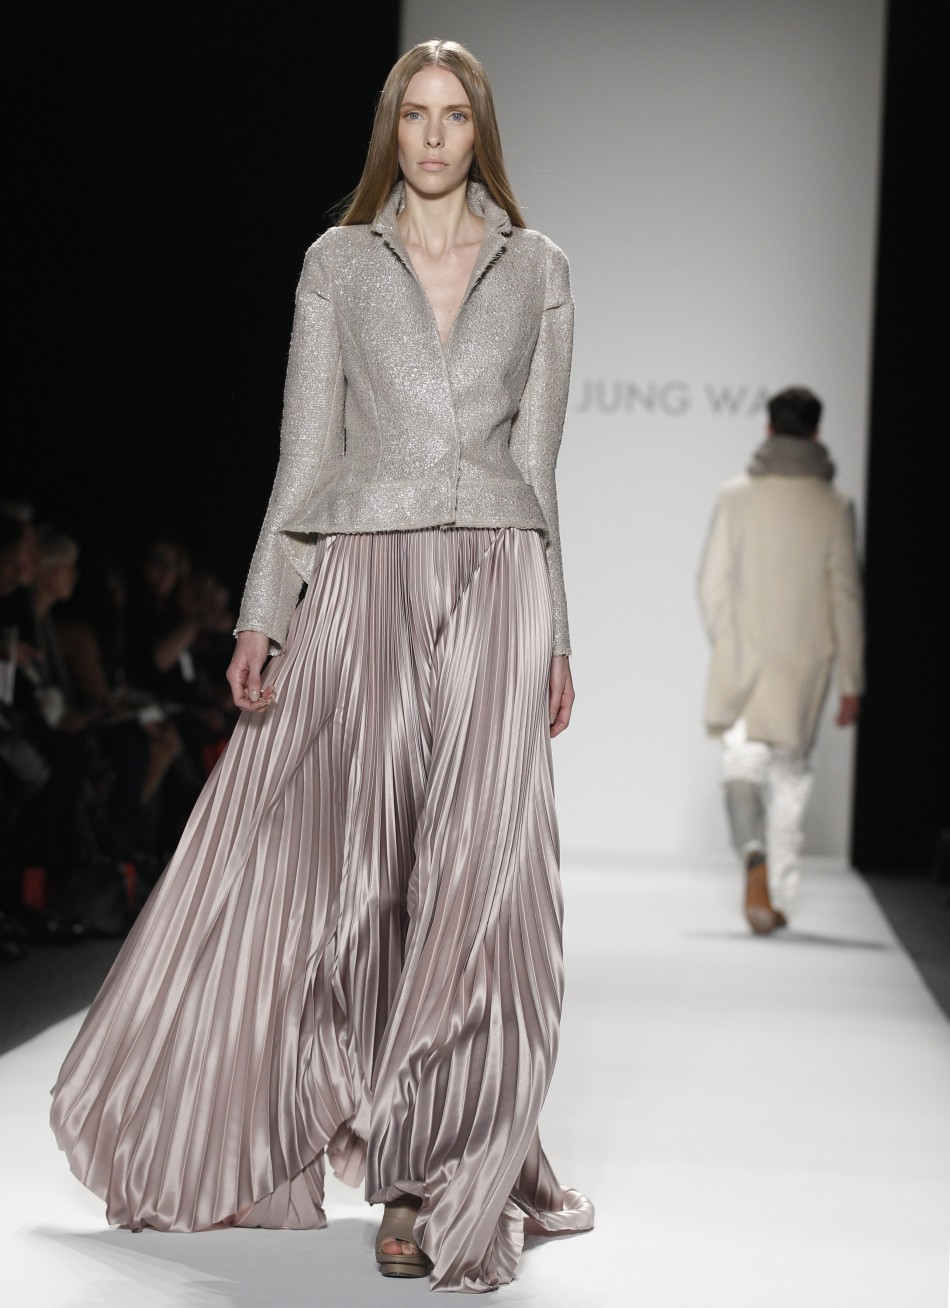 New York Fashion Week Spring/Summer 2012